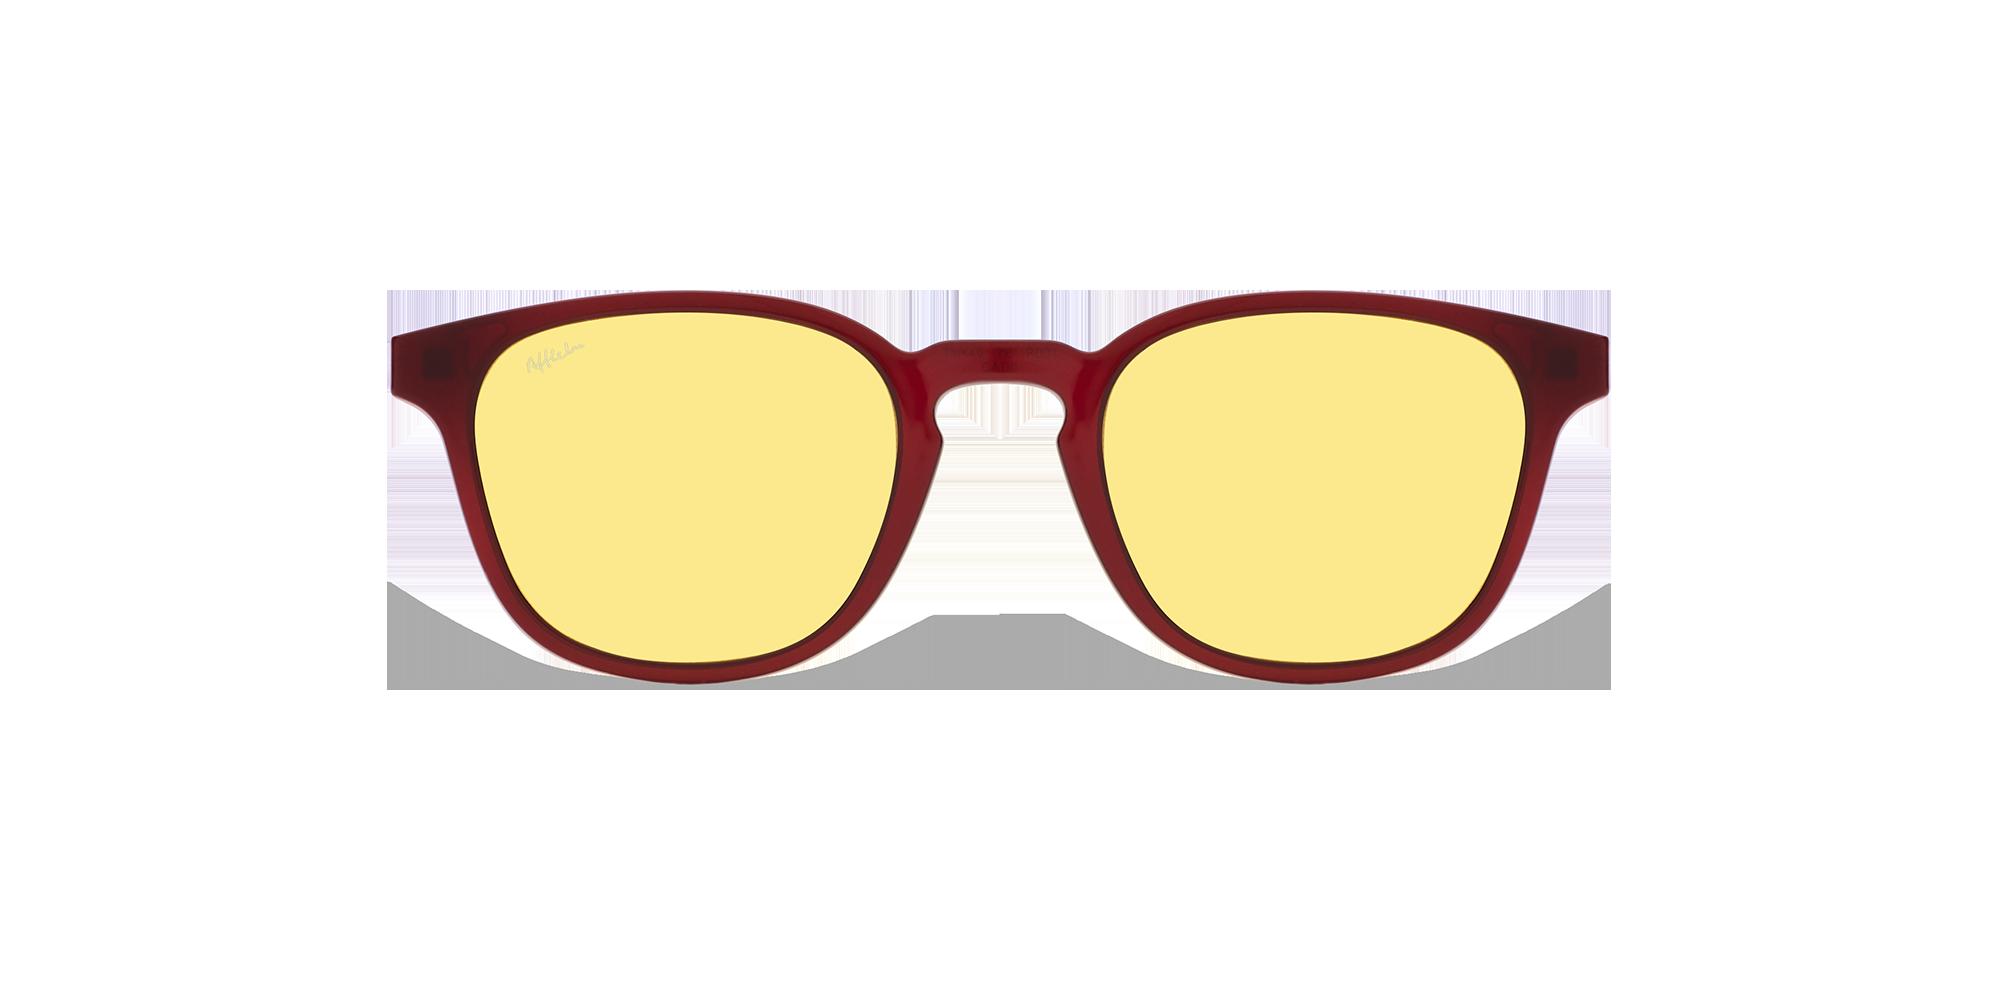 afflelou/france/products/smart_clip/clips_glasses/07630036429266_face.png